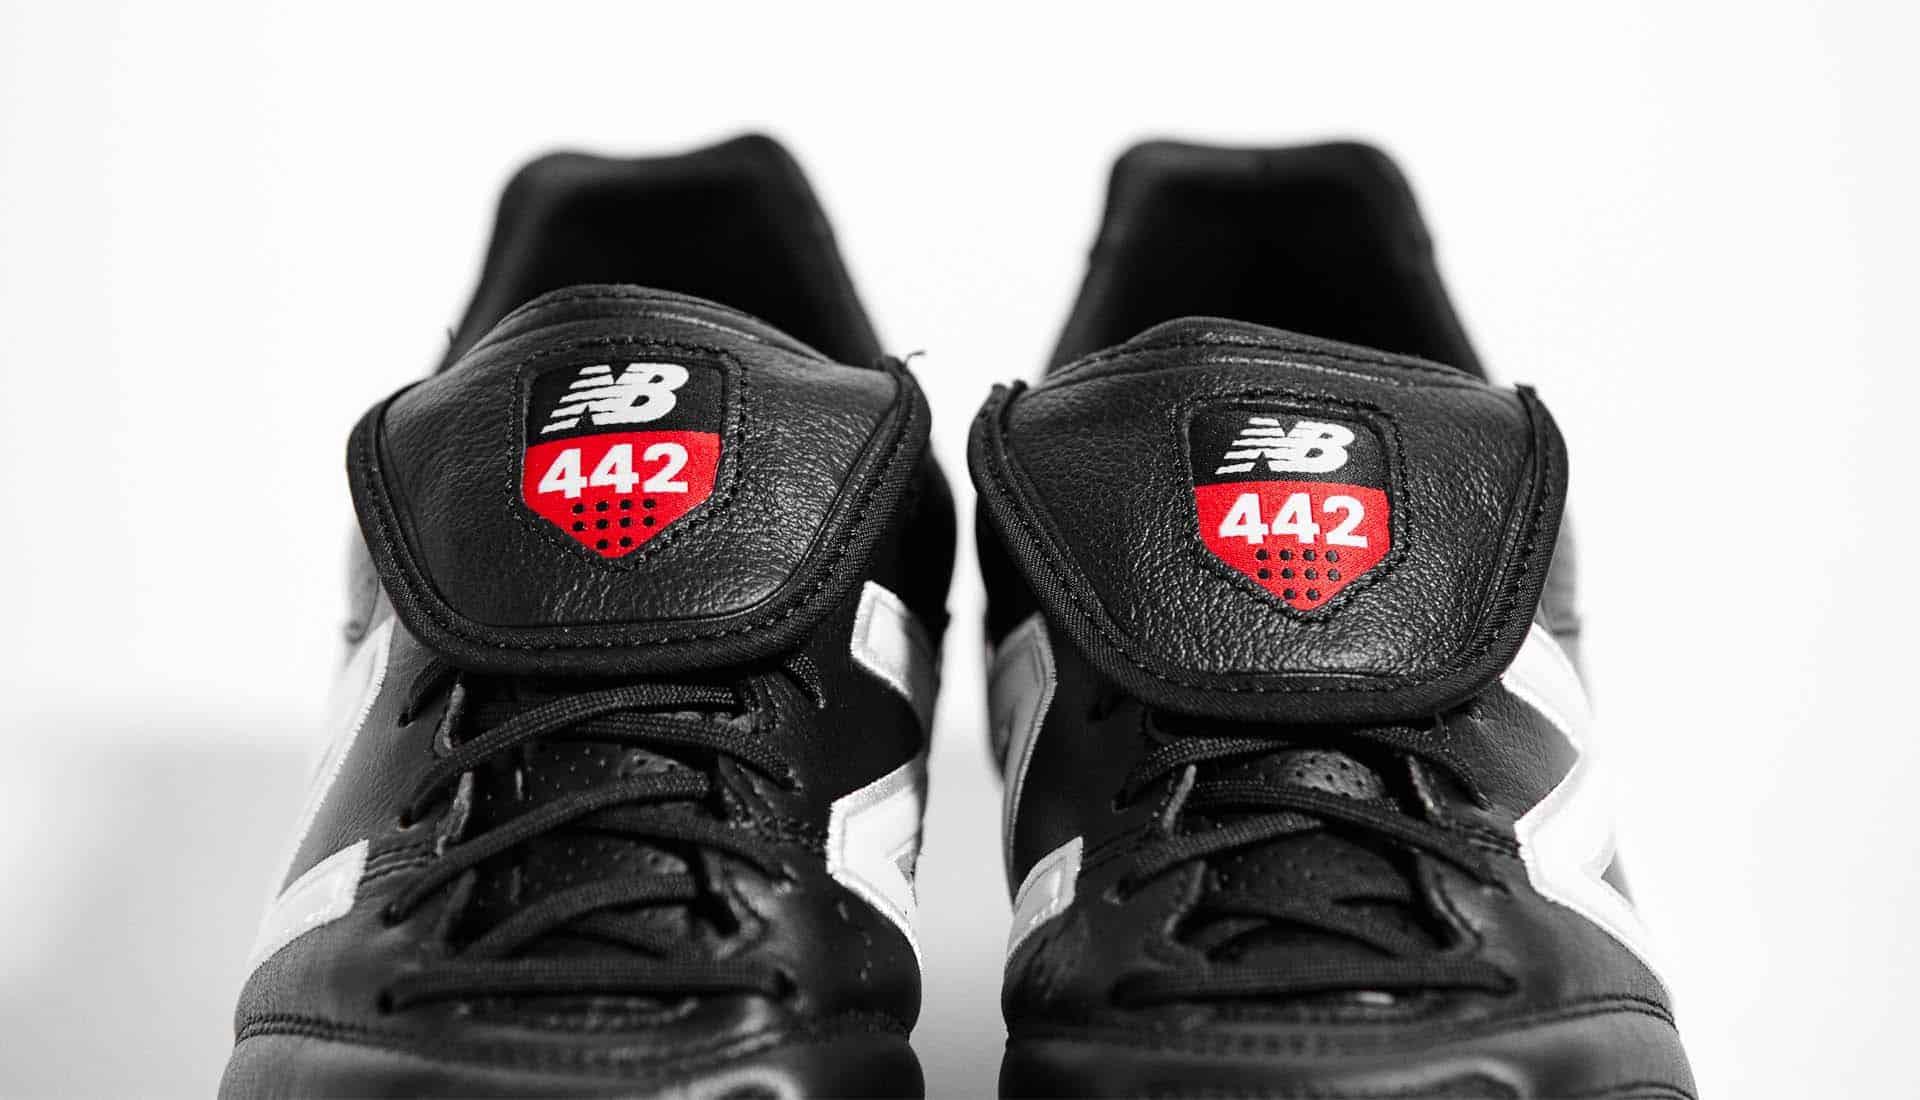 chaussures-football-New-Balance-4-4-2-noir-blanc-img8